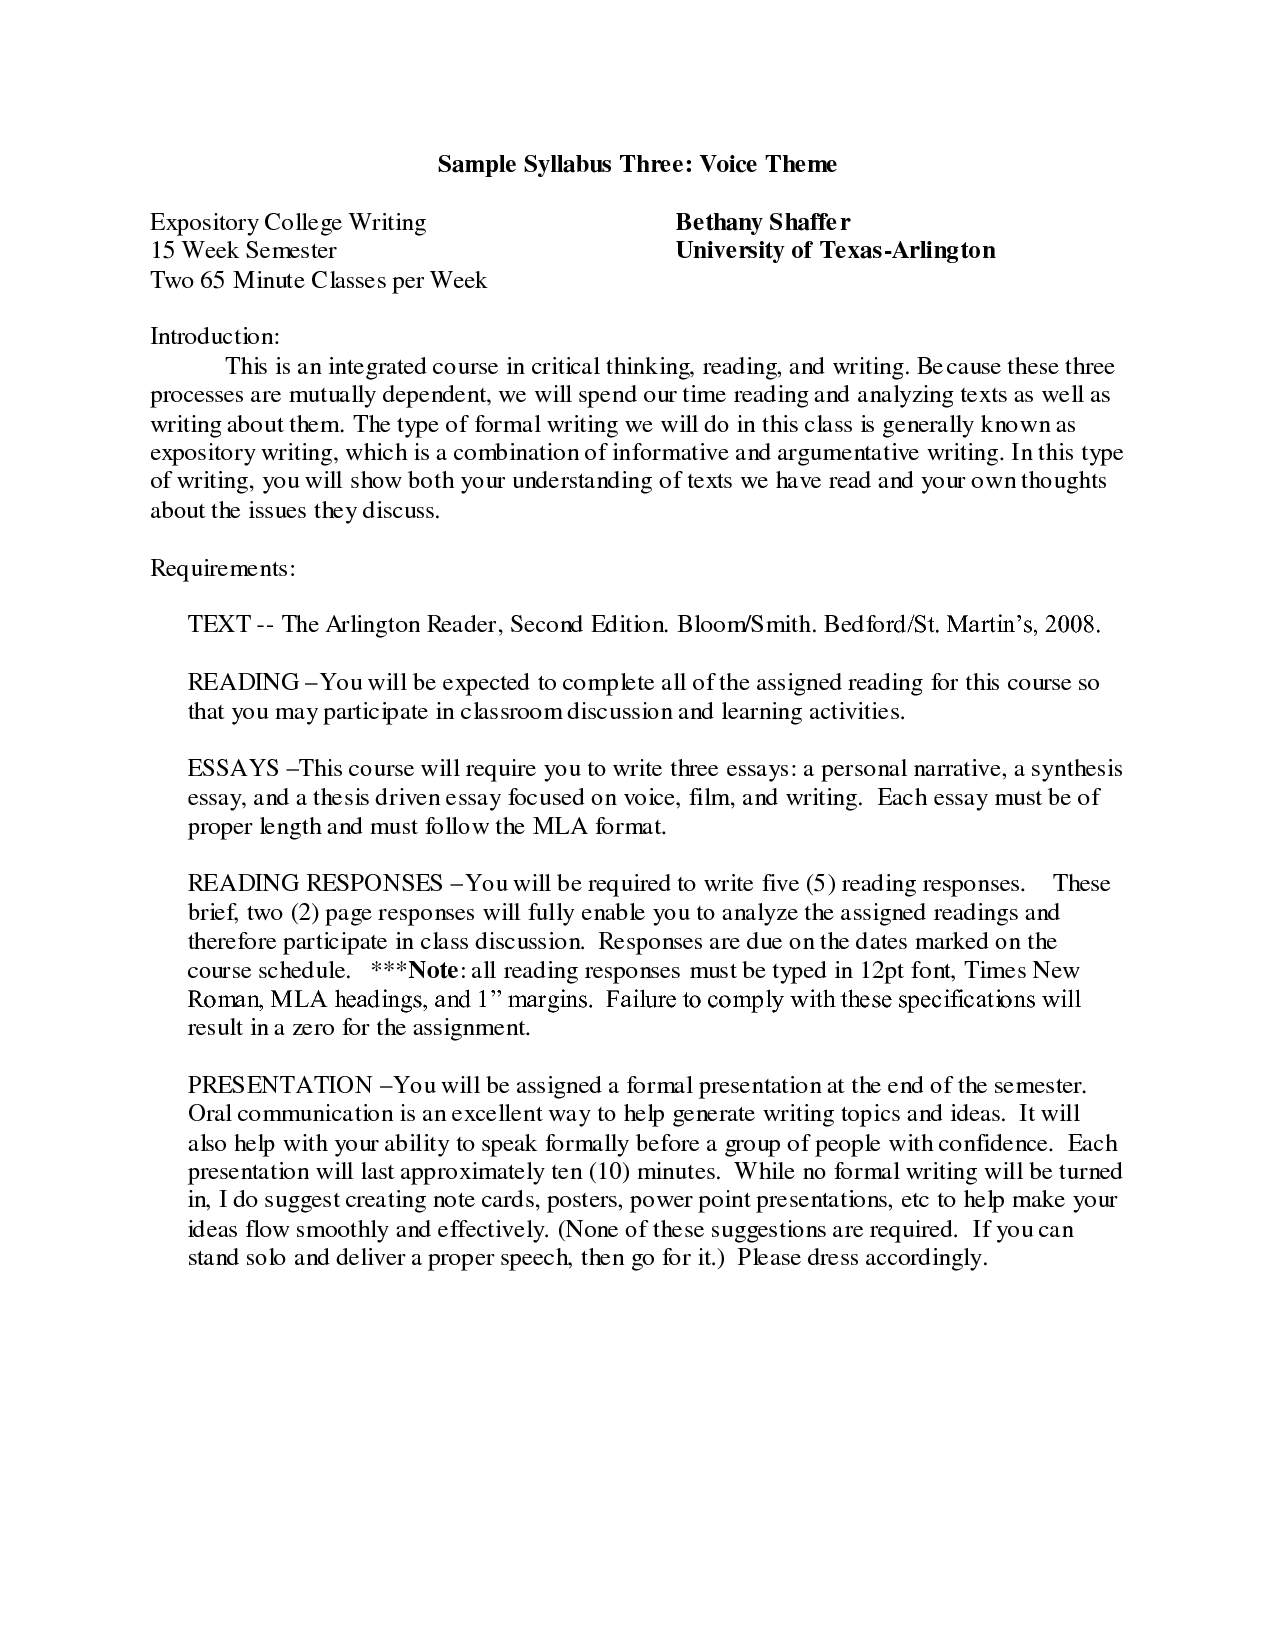 Stanford registrar thesis